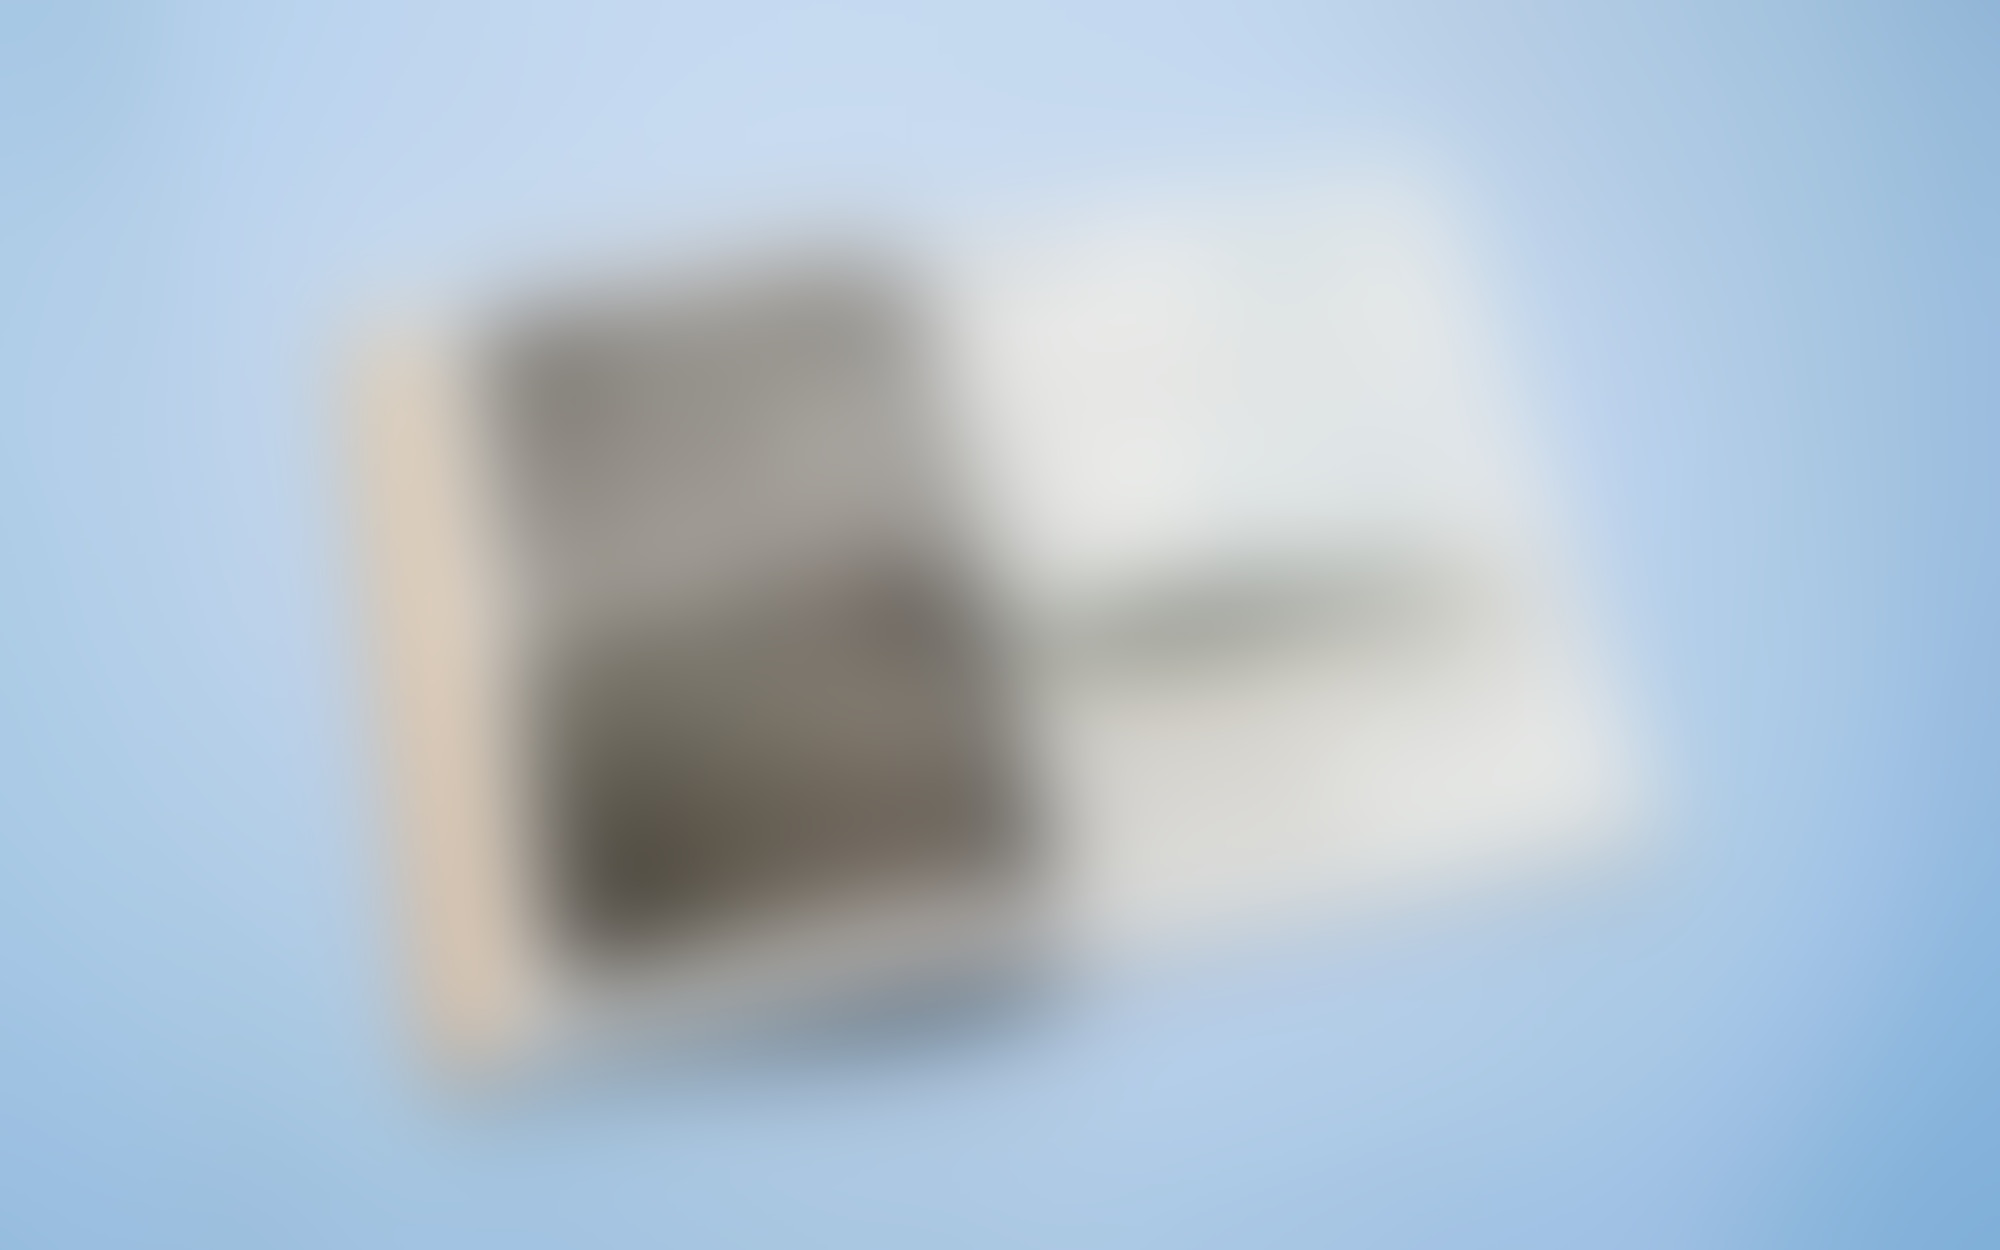 CXMR22 autocompressfitresizeixlibphp 1 1 0max h2000max w3 D2000q80s4bbc216ea1ac6960419ed88816c317c0